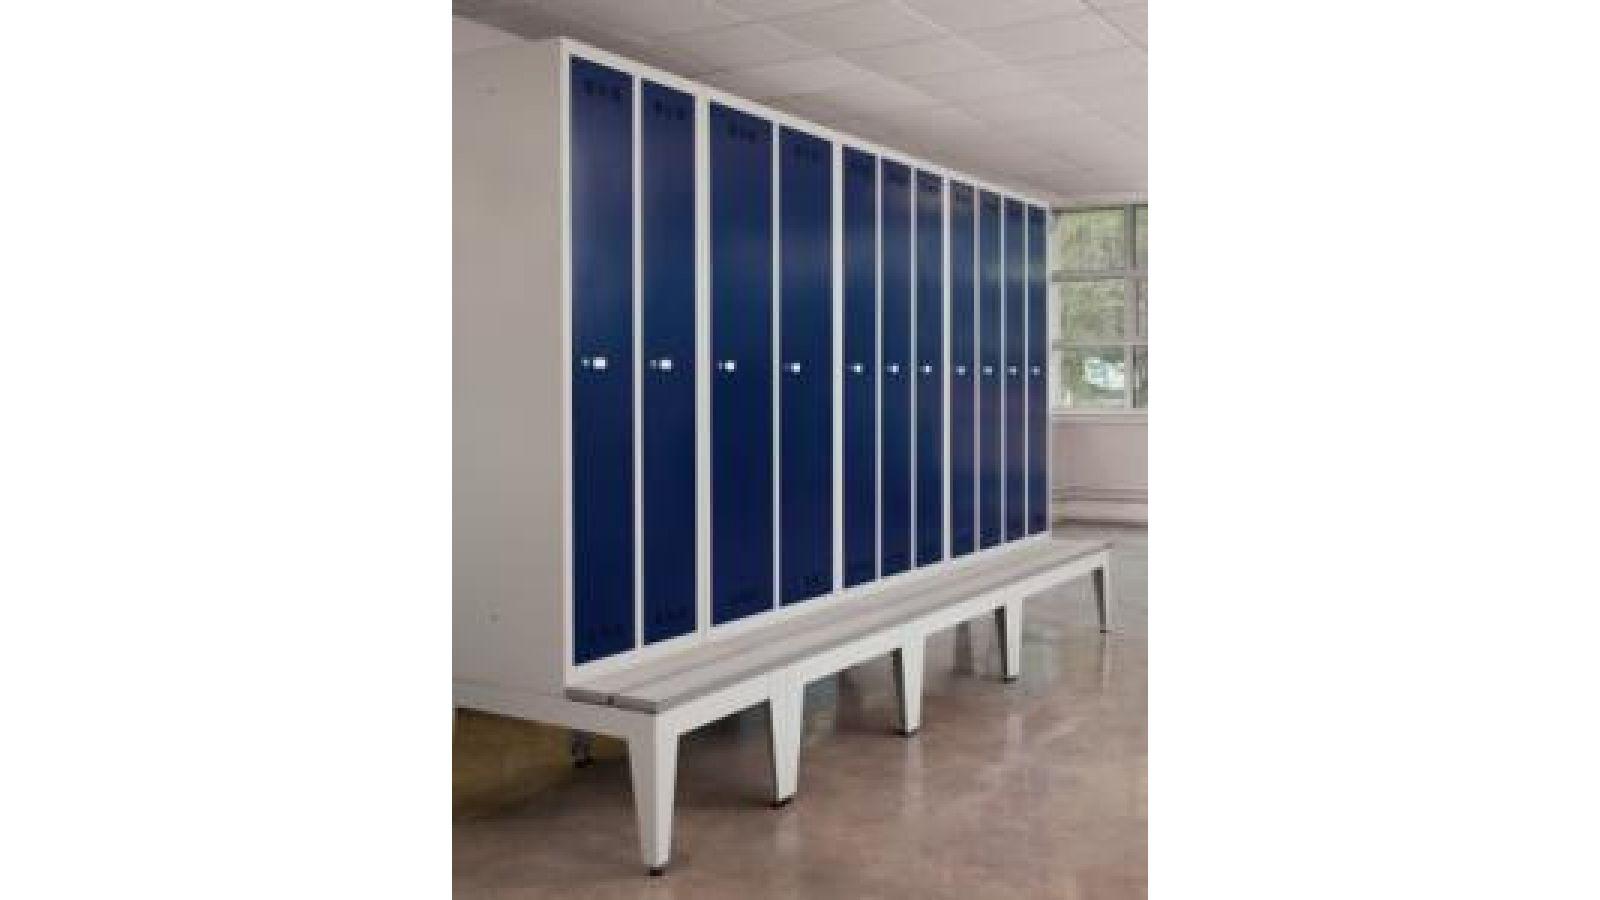 MonoBloc lockers